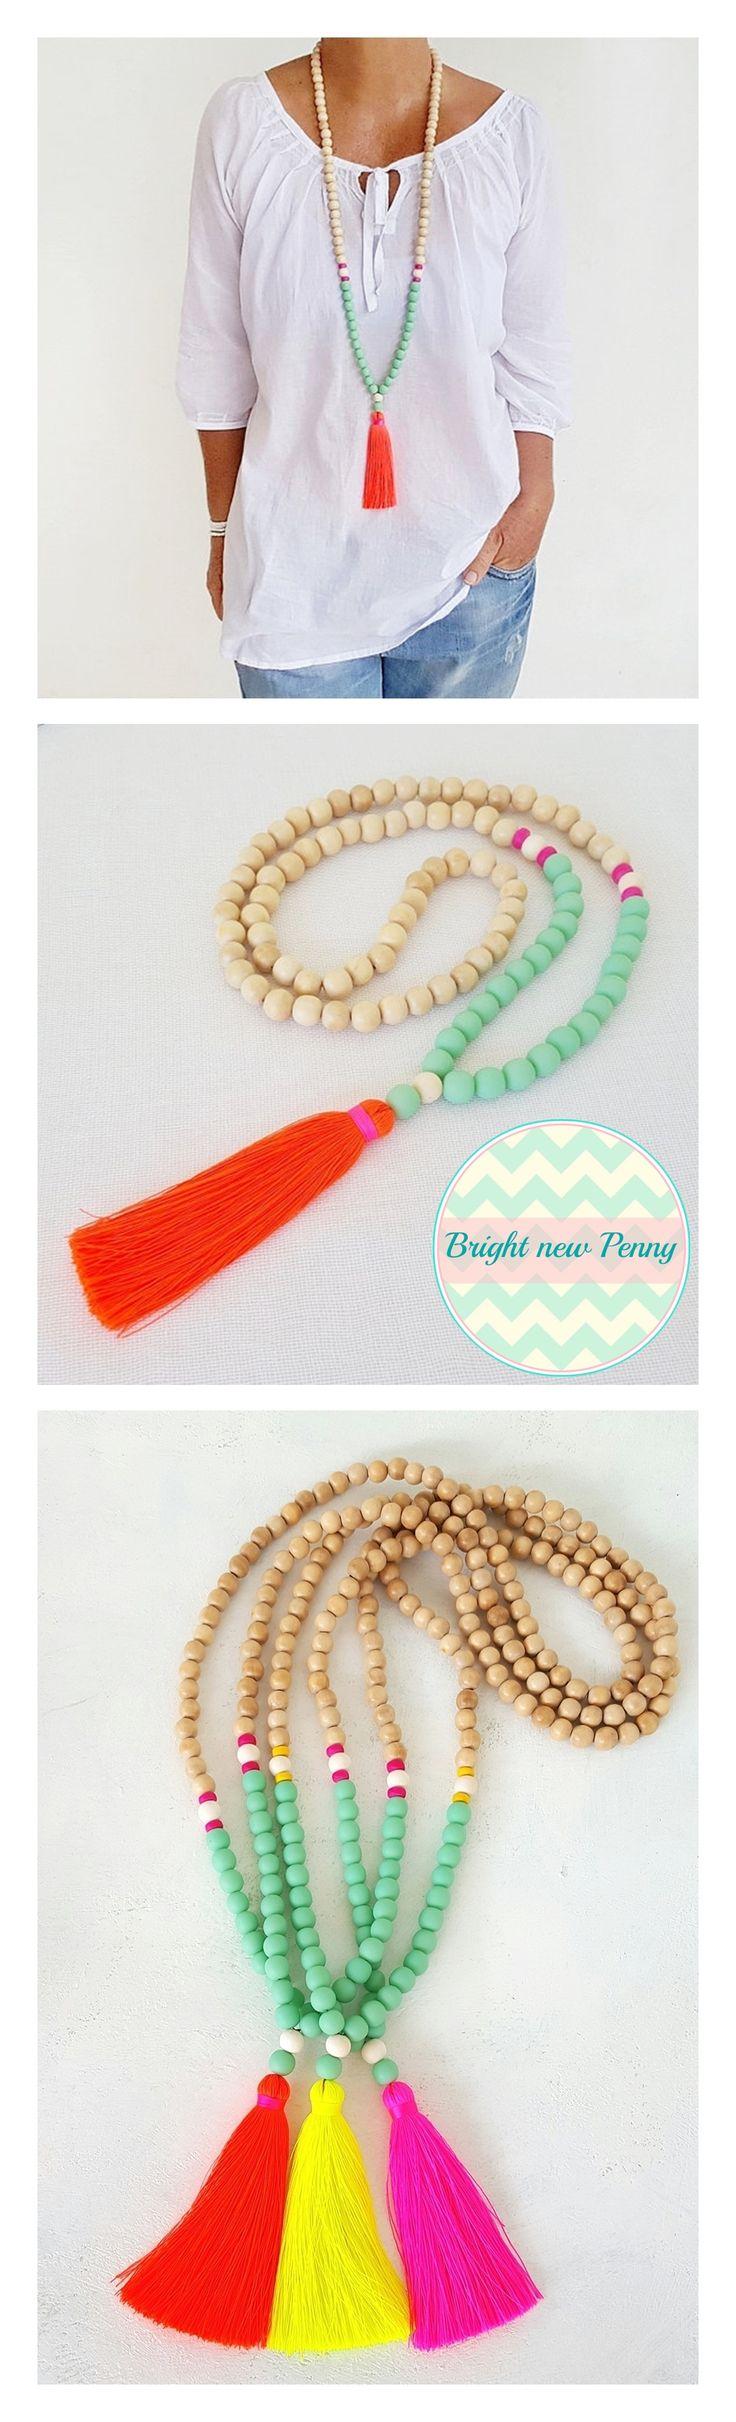 Tassel necklaces ! Color love - Summer neons -  Shop Tassel necklaces ...  https://www.etsy.com/shop/Brightnewpenny  #tasselnecklaces #tassel #necklaces